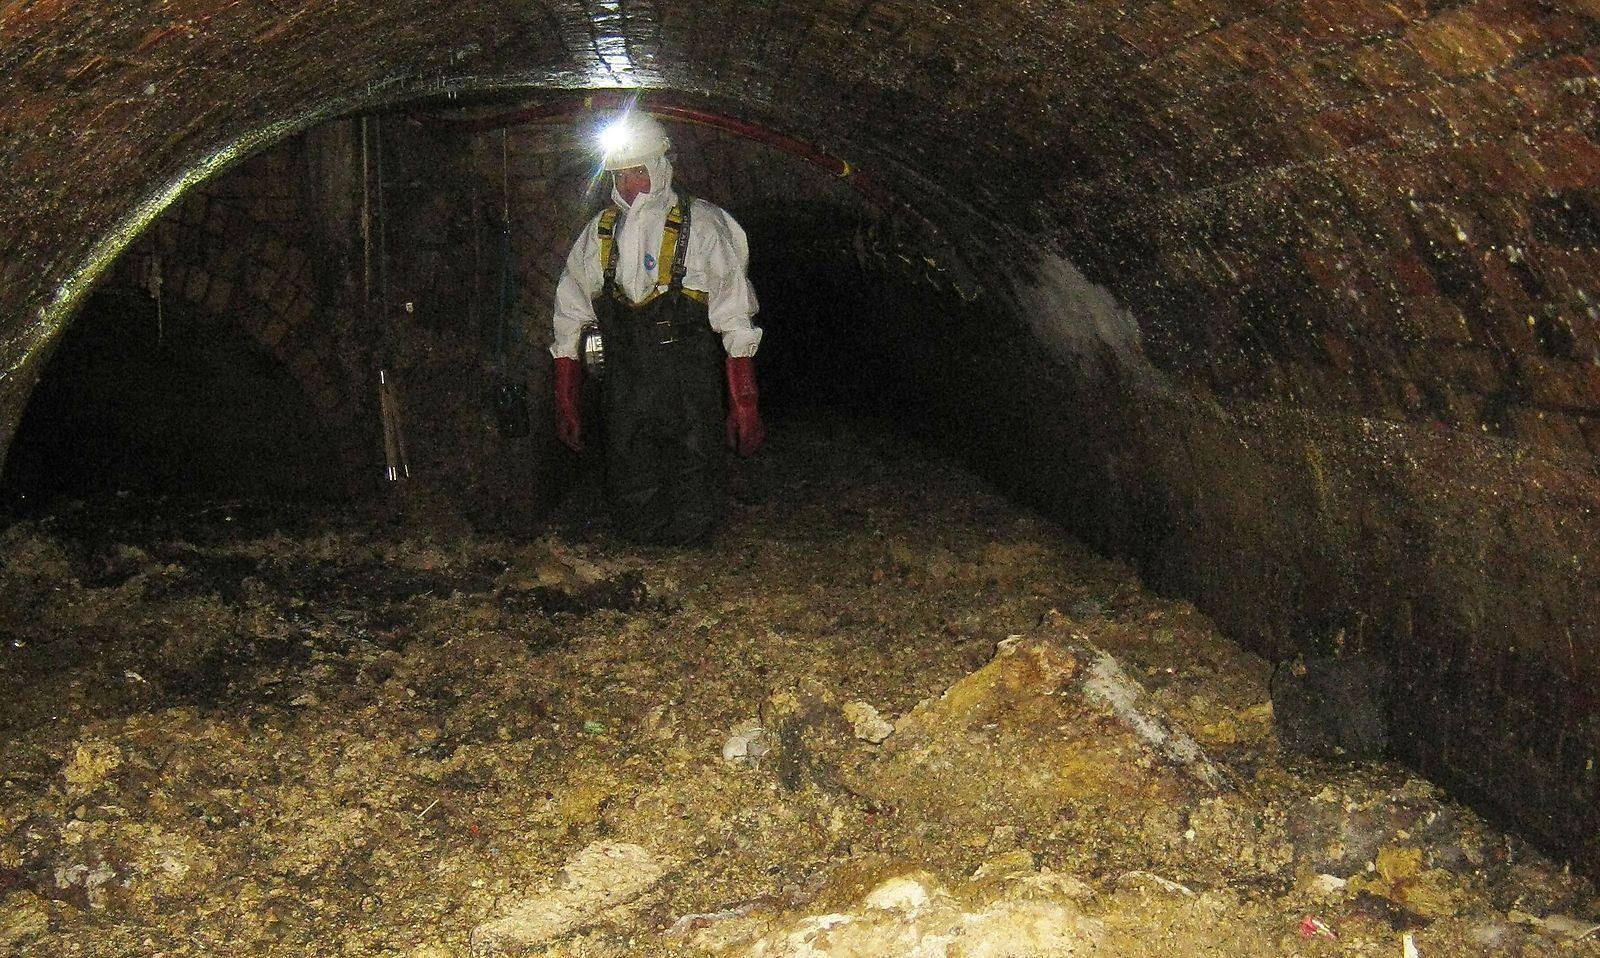 Extrem Riesiger Fettberg blockiert Londoner Abwasserkanal « DiePresse.com WA44